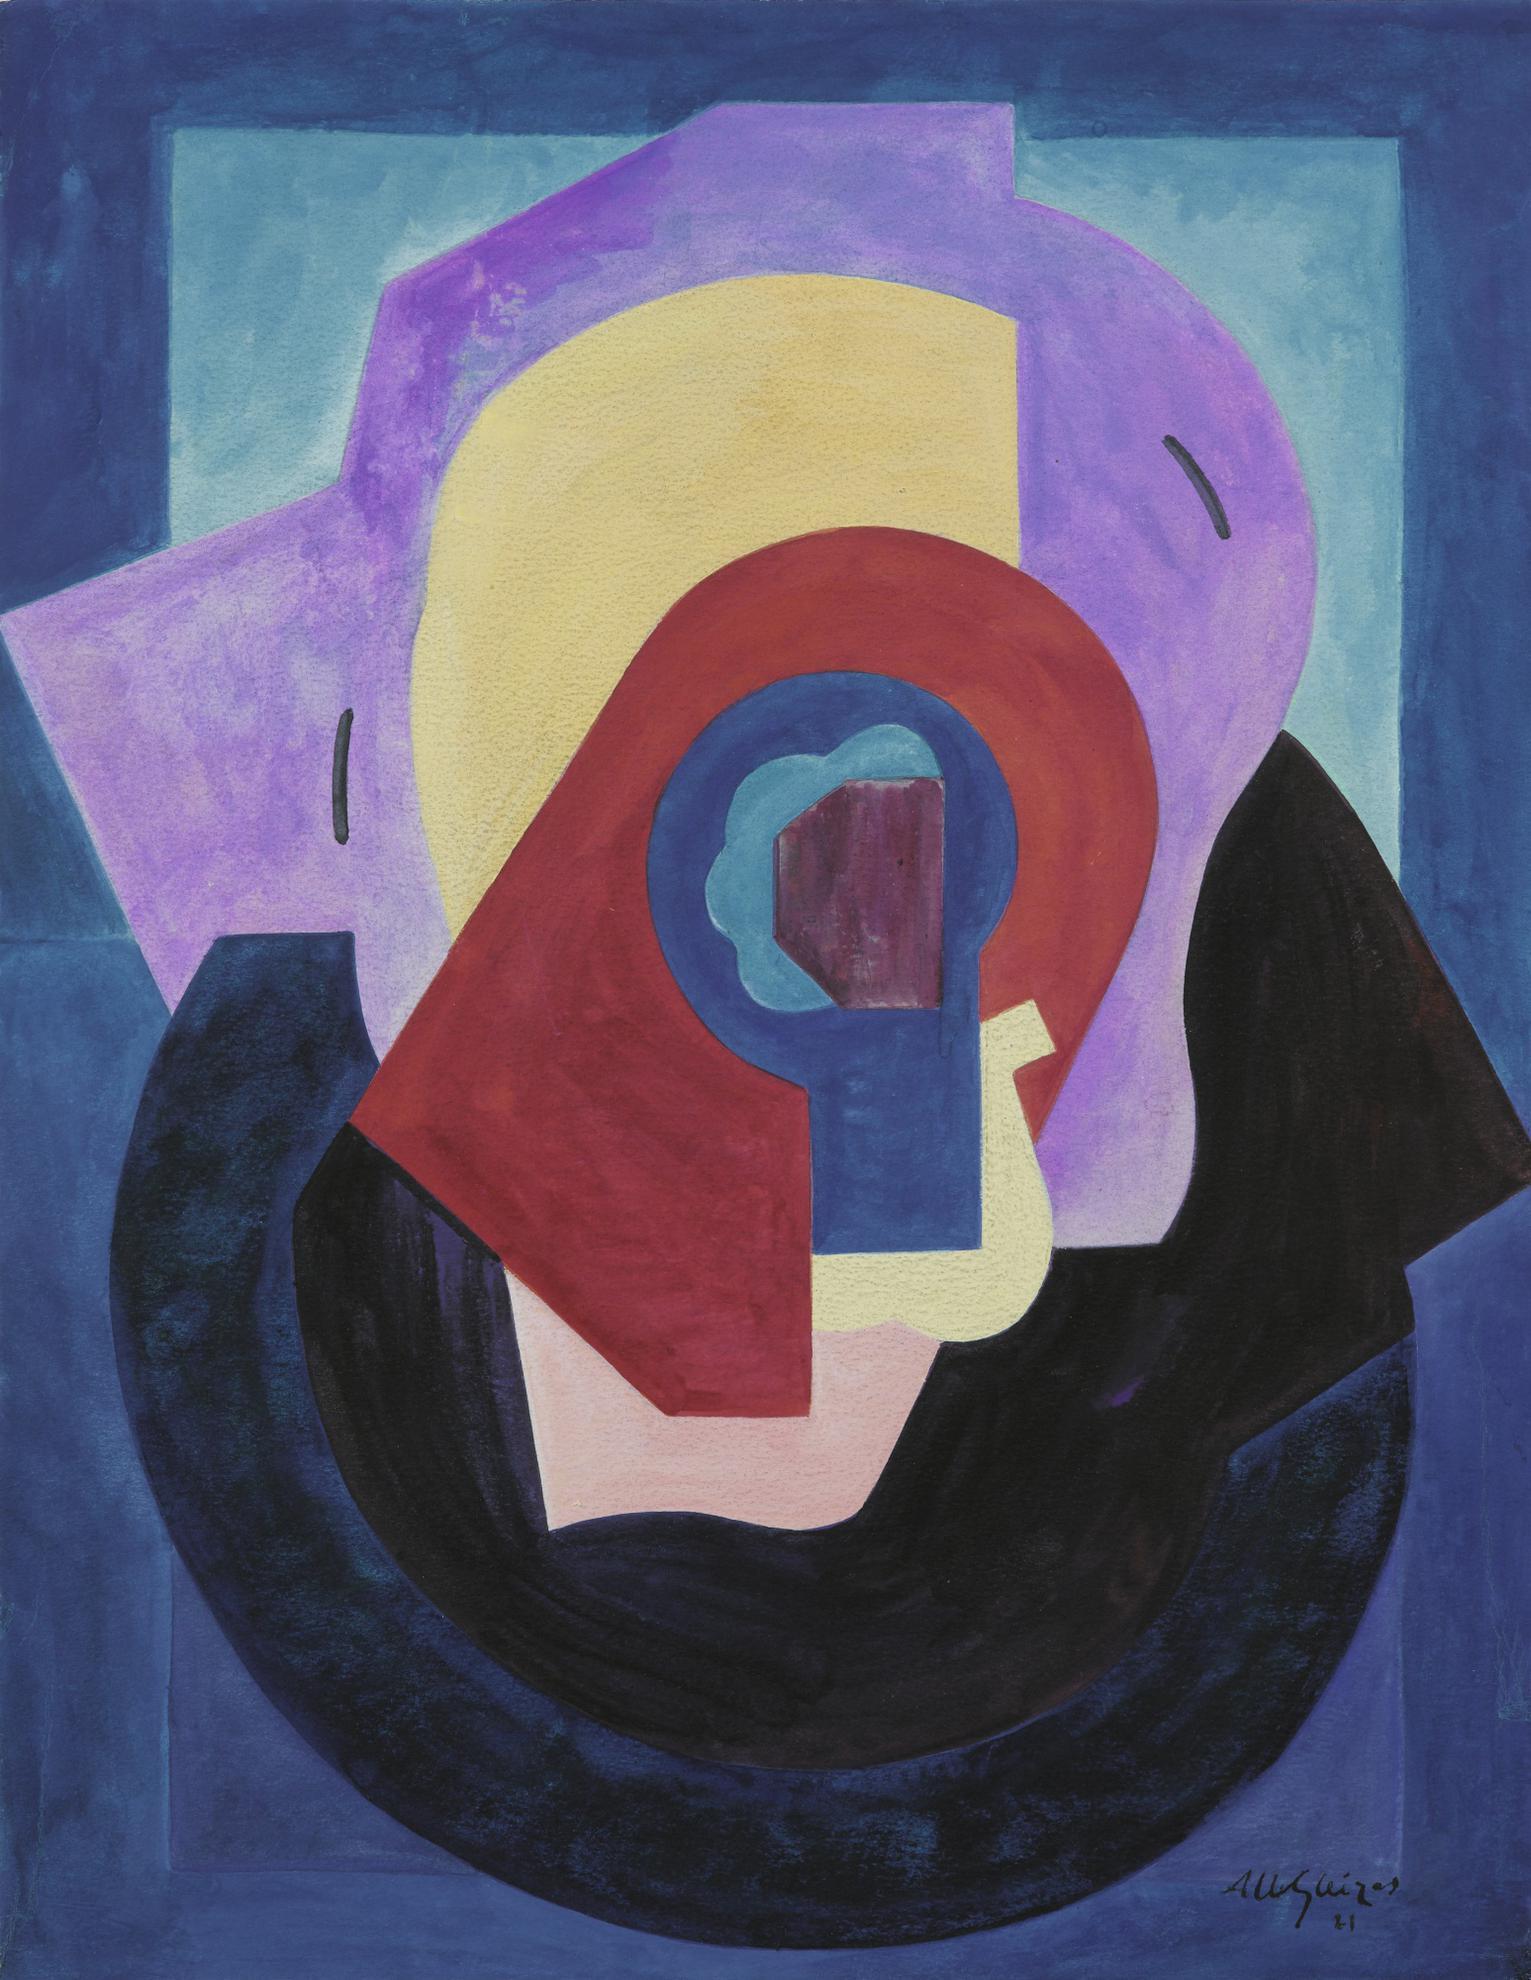 Albert Gleizes-Composition-1921